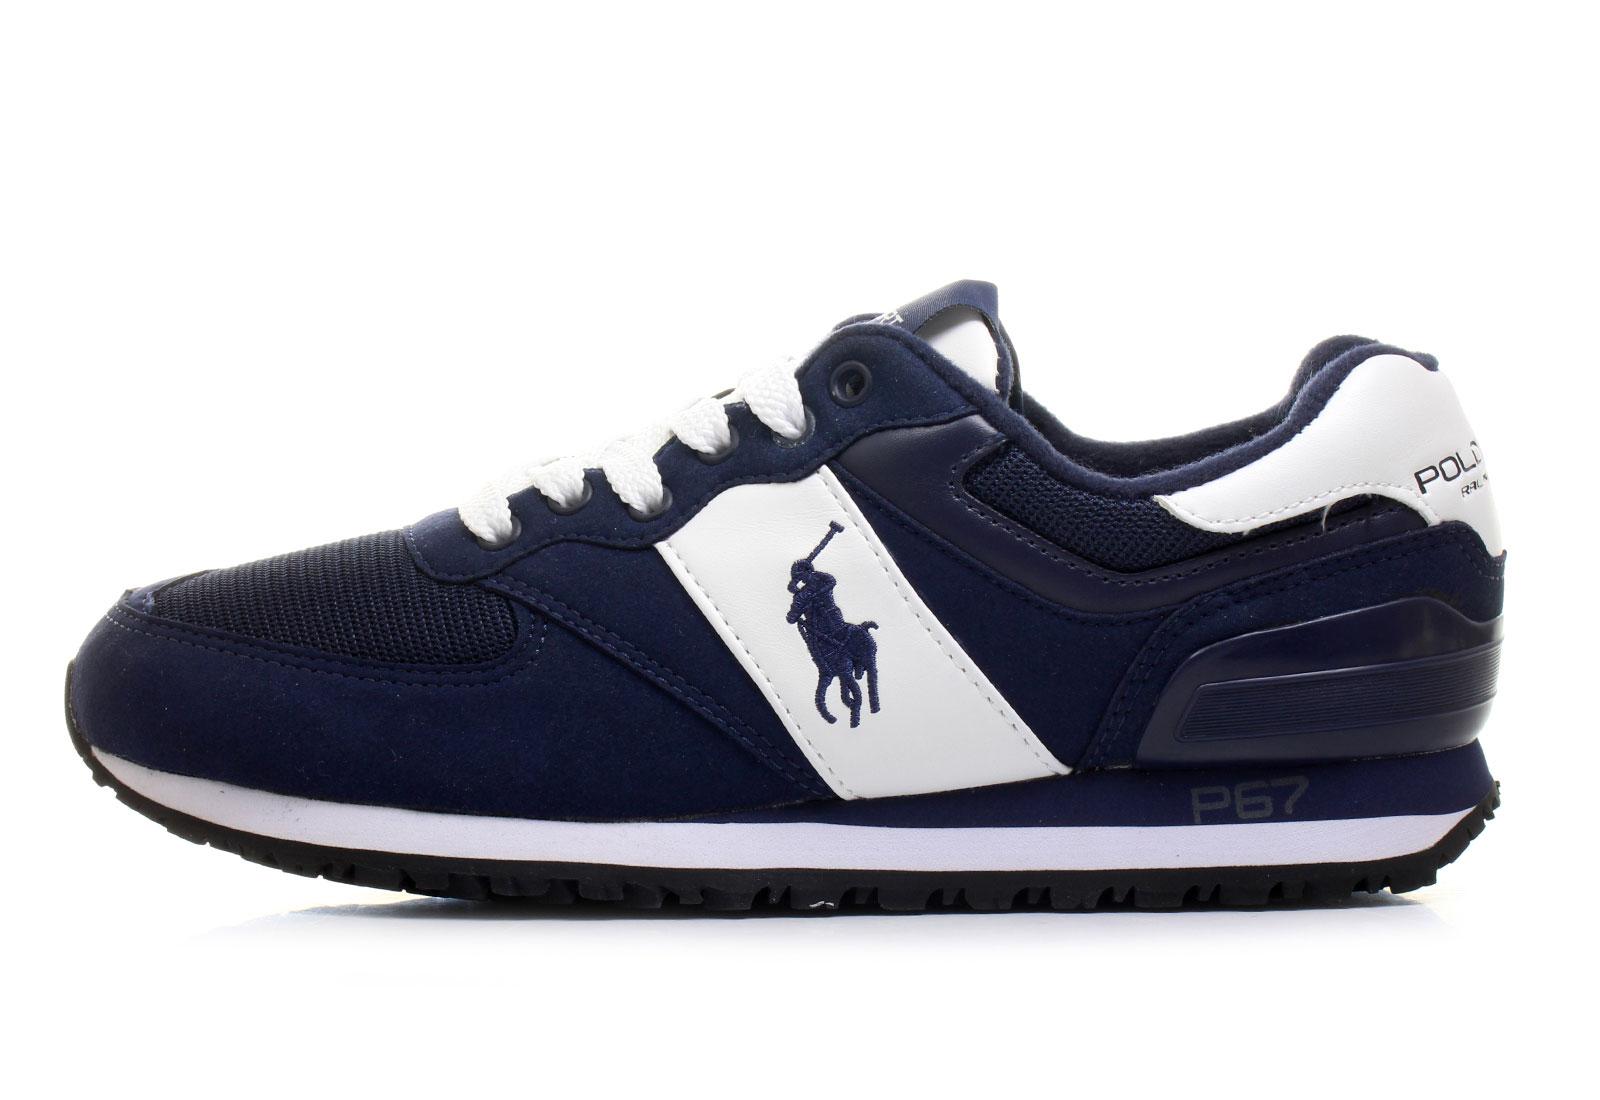 41f99a7a7a Polo Ralph Lauren Nízké boty Slaton Pony 3